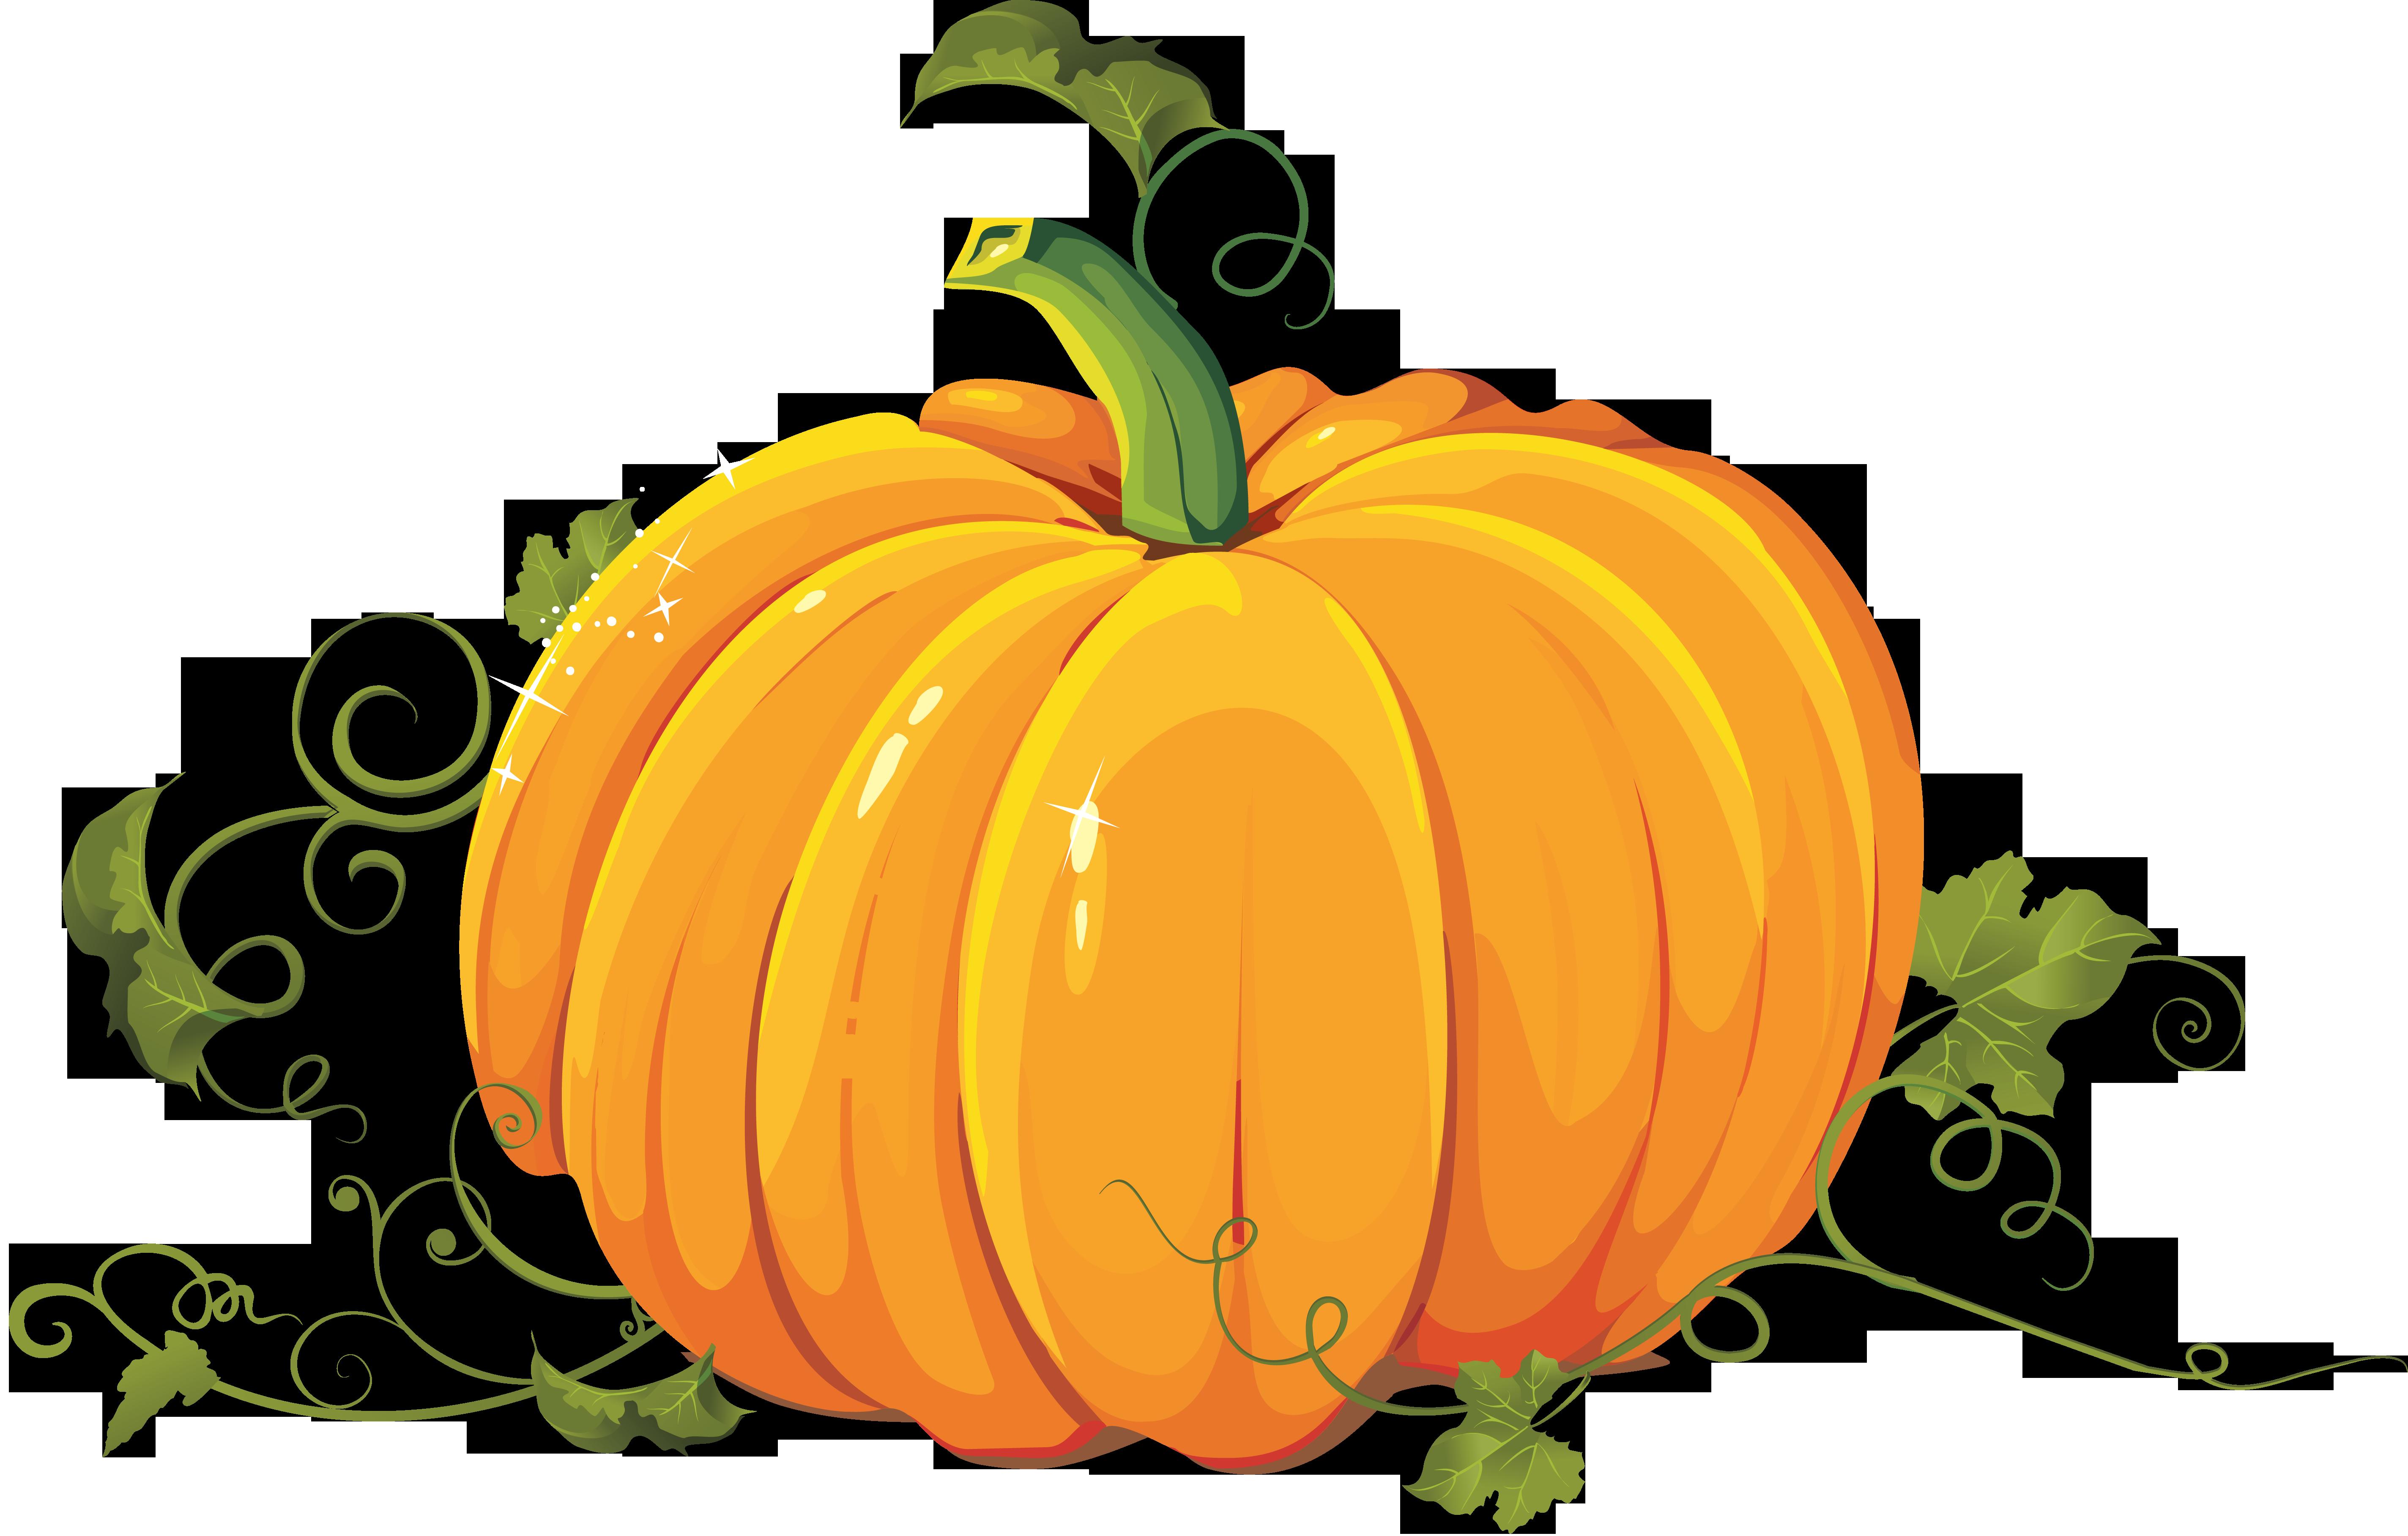 Pumpkin PNG Image